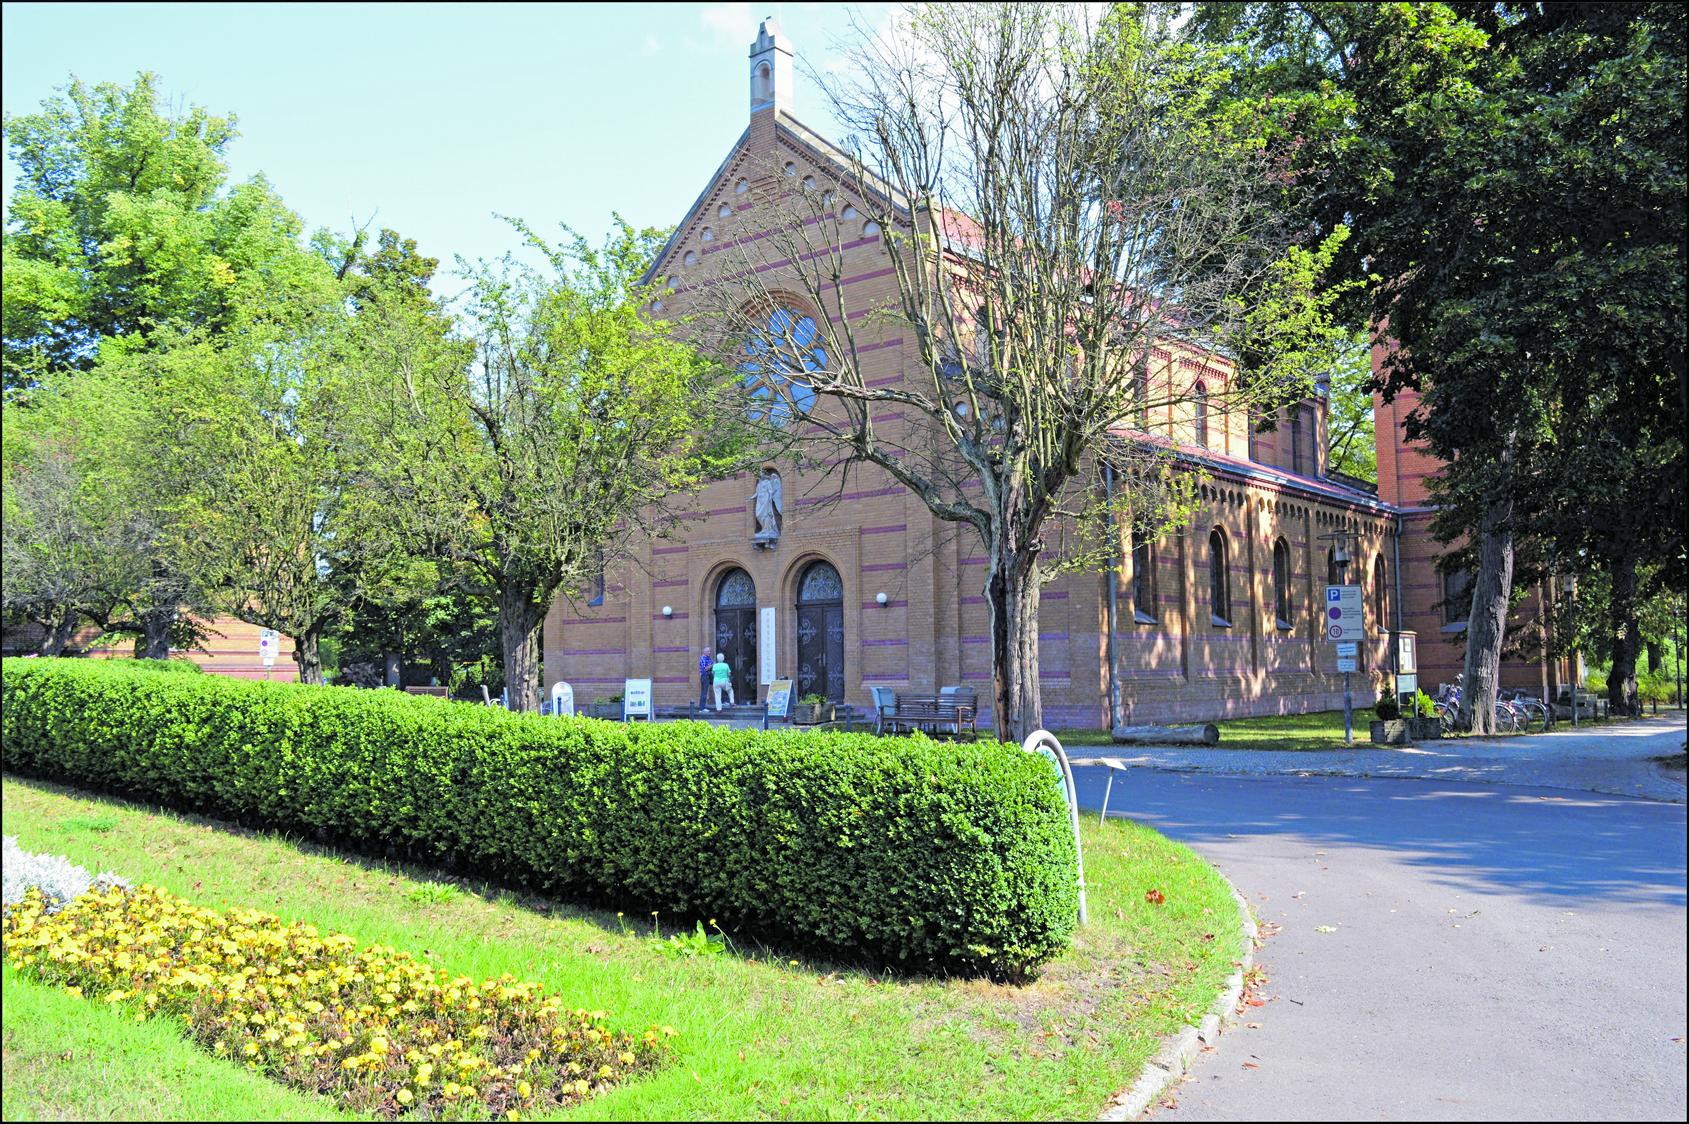 So, 22.08. | ab 17.00 Uhr: Sommerliches Vogelkonzert | Krankenhauskirche im Wuhlgarten | Brebacher Weg 15